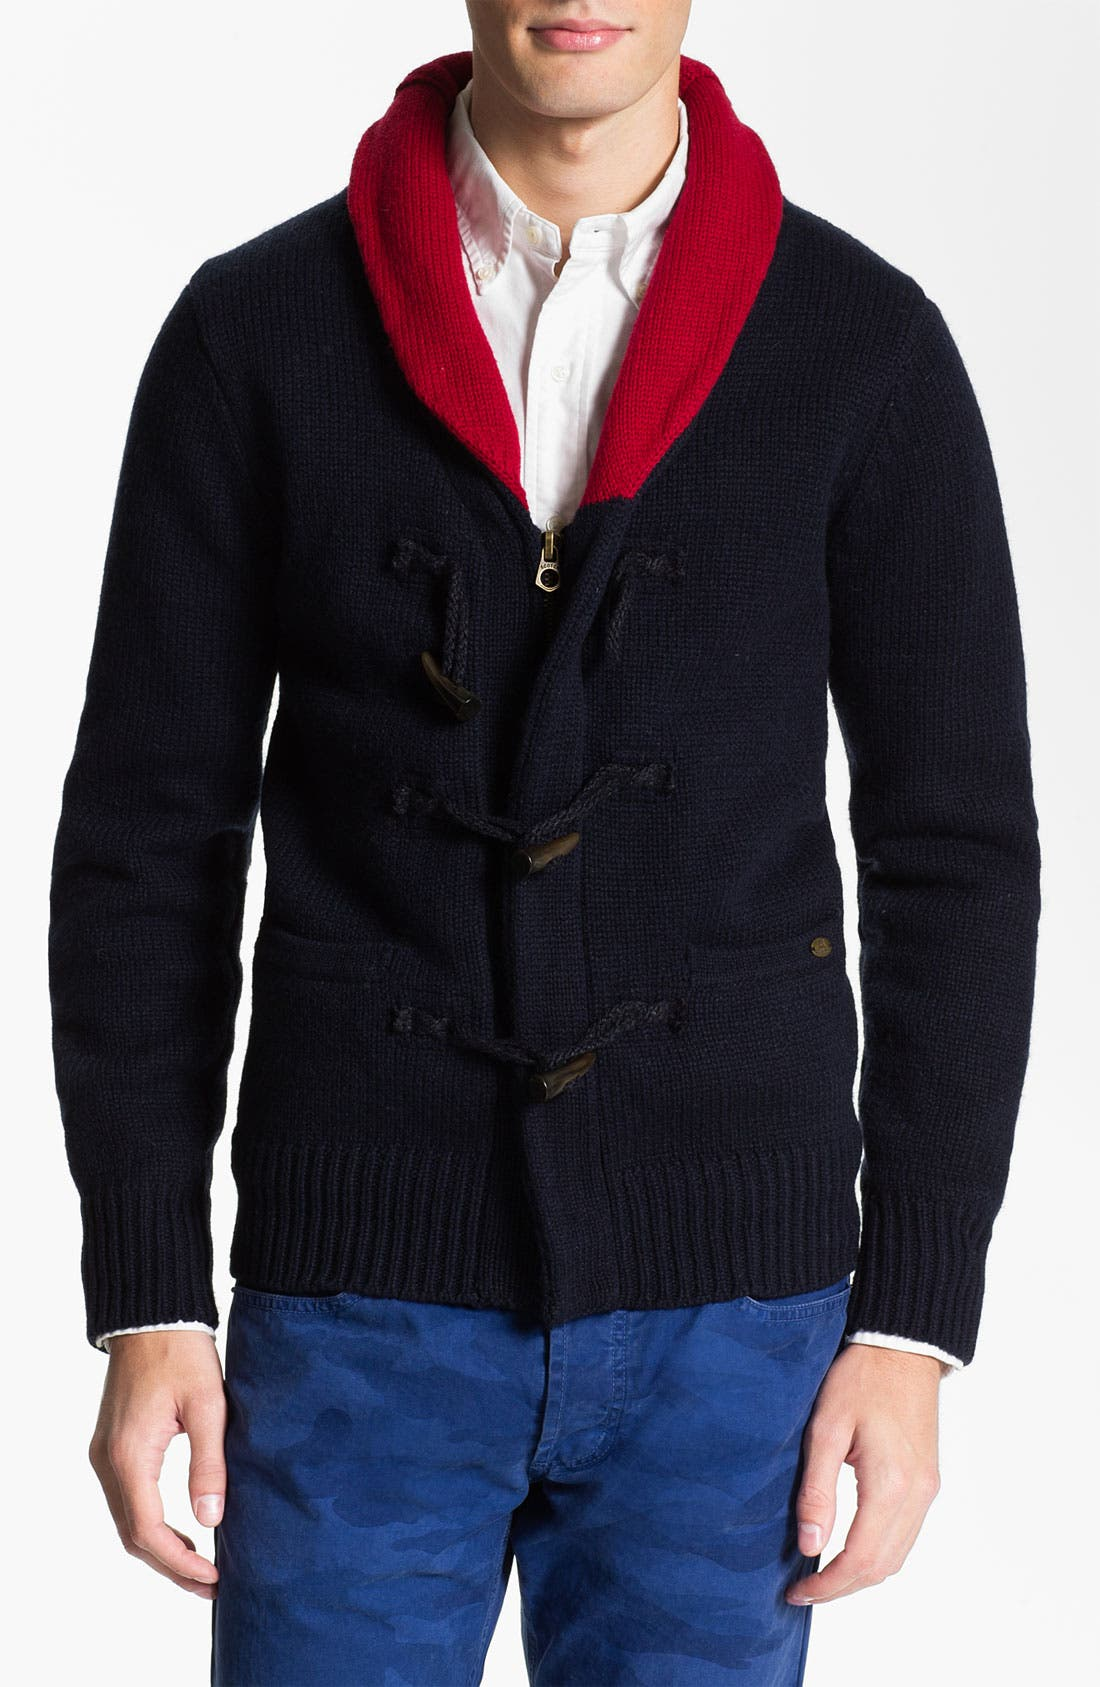 Main Image - Scotch & Soda Shawl Collar Wool Blend Cardigan